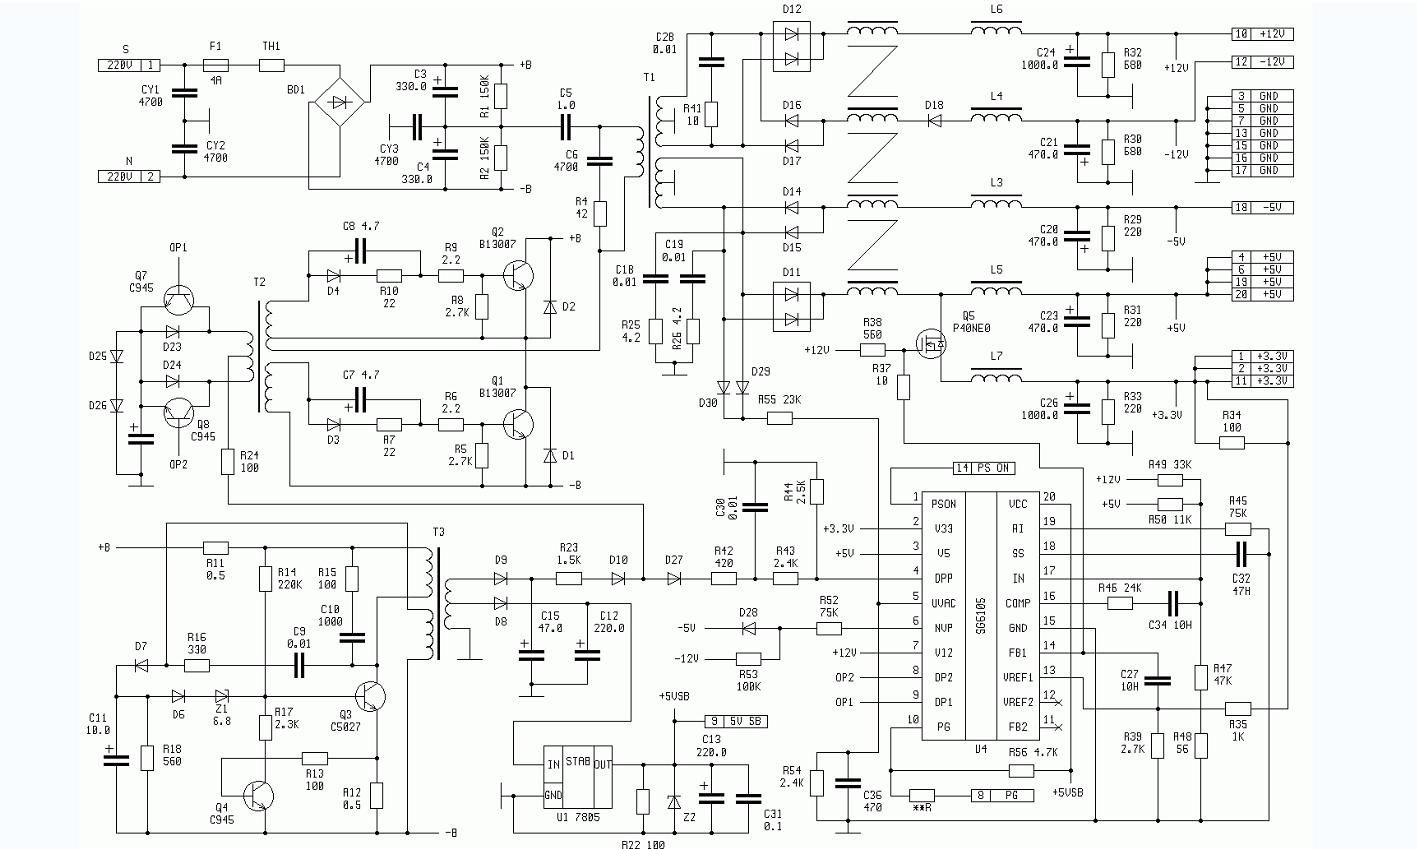 atx250 sg6105电脑电源的电路原理图免费下载